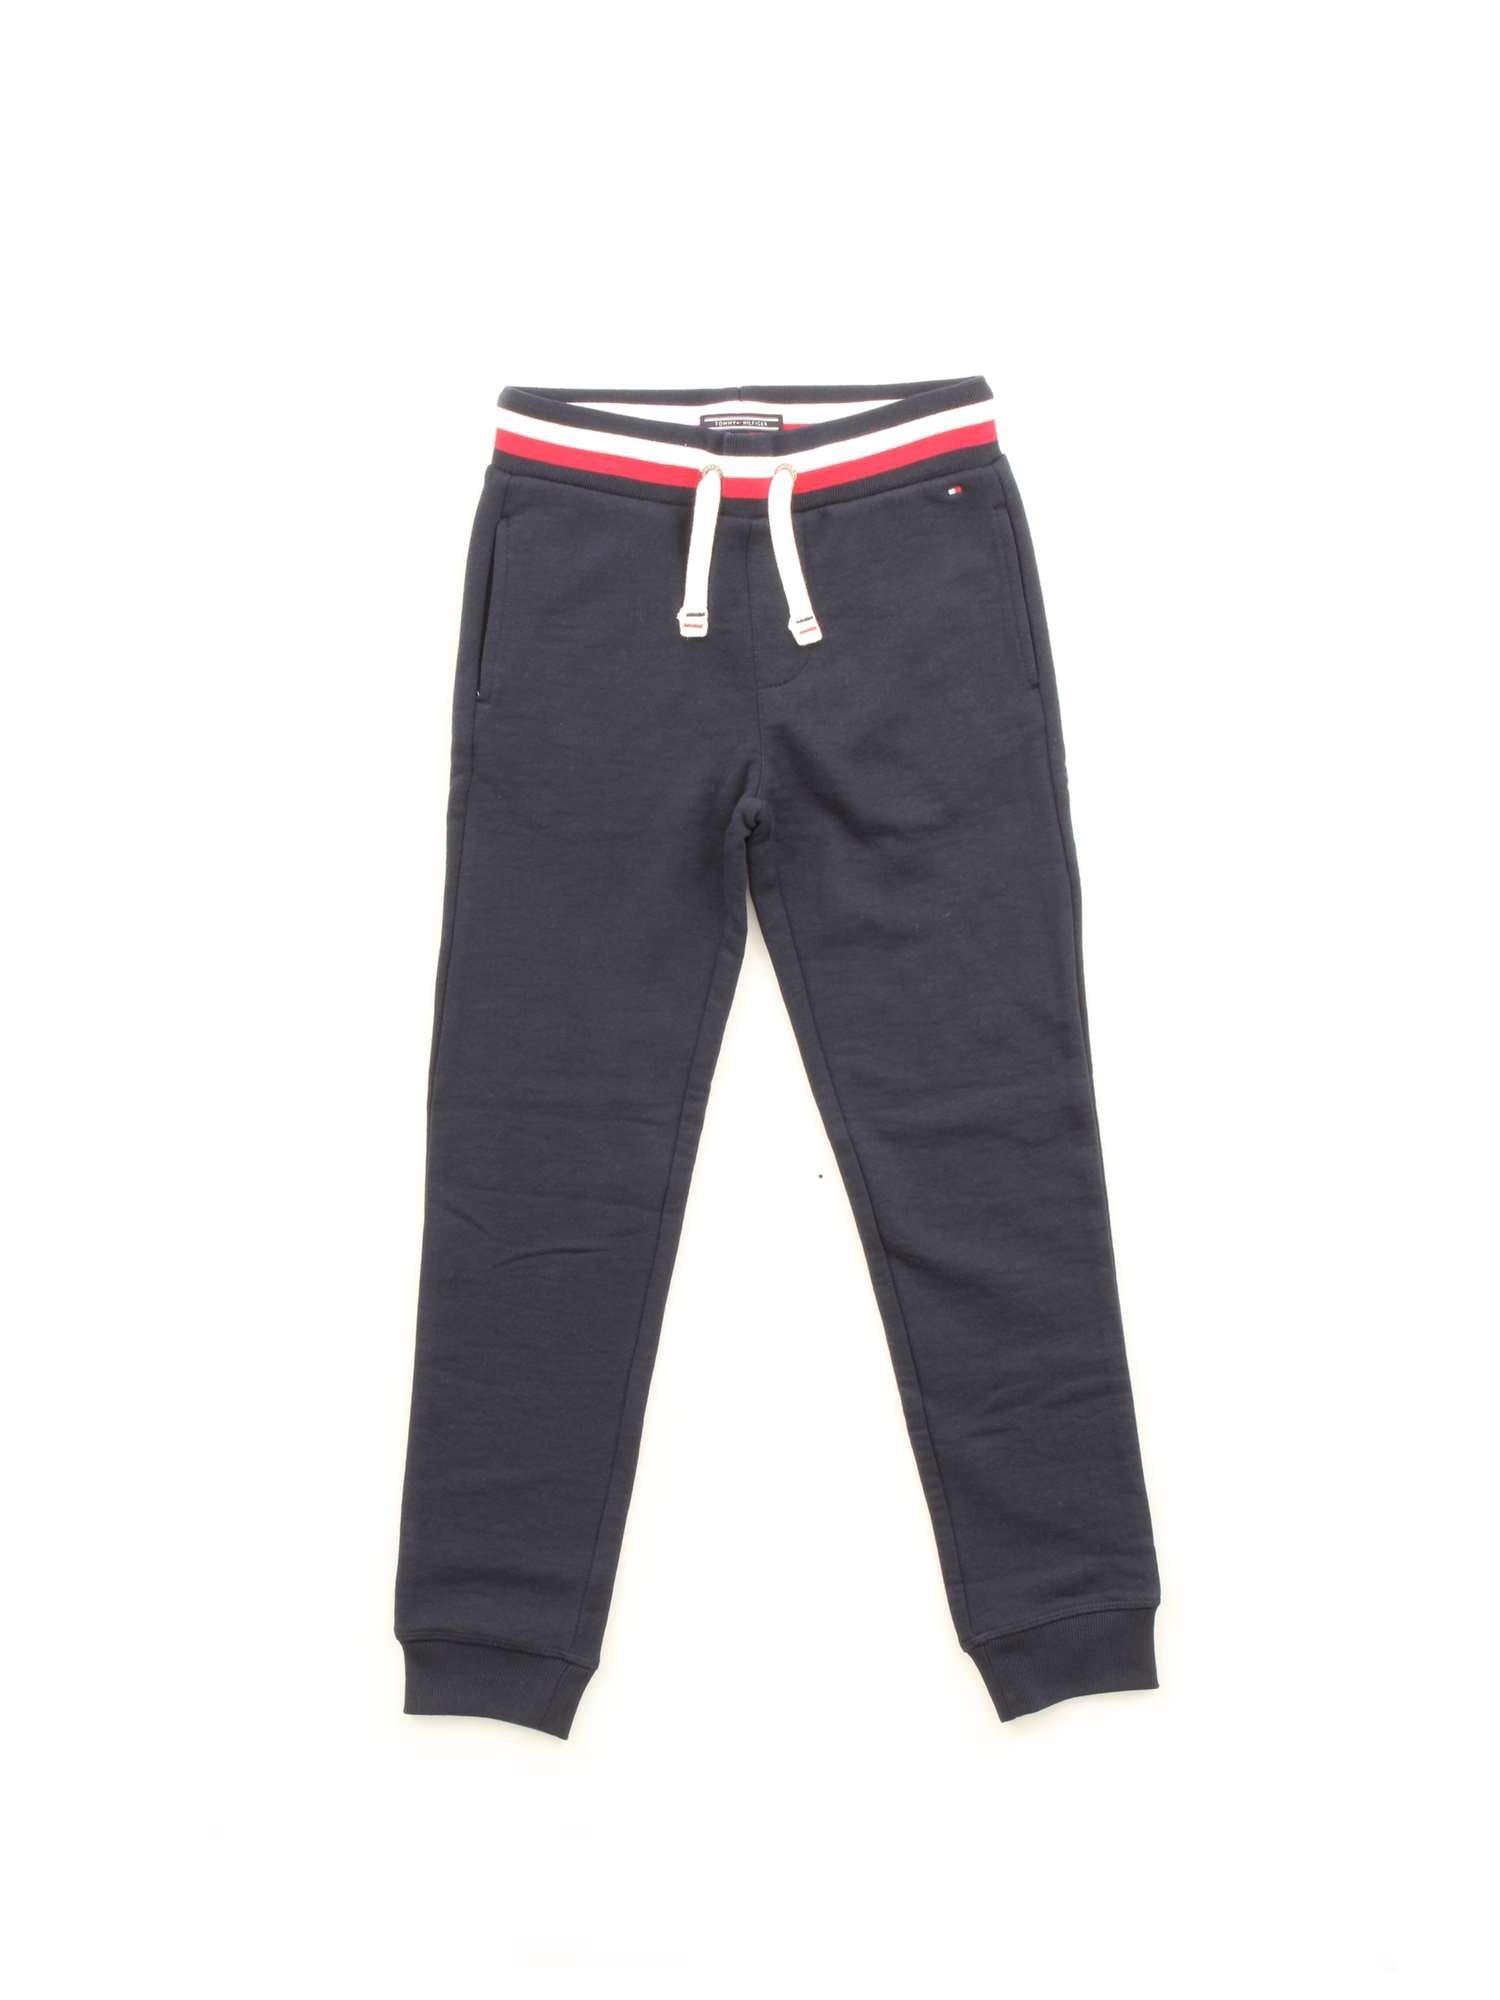 Tommy Hilfiger Ame Tommy Sweatpant Pantalones deportivos para Niños